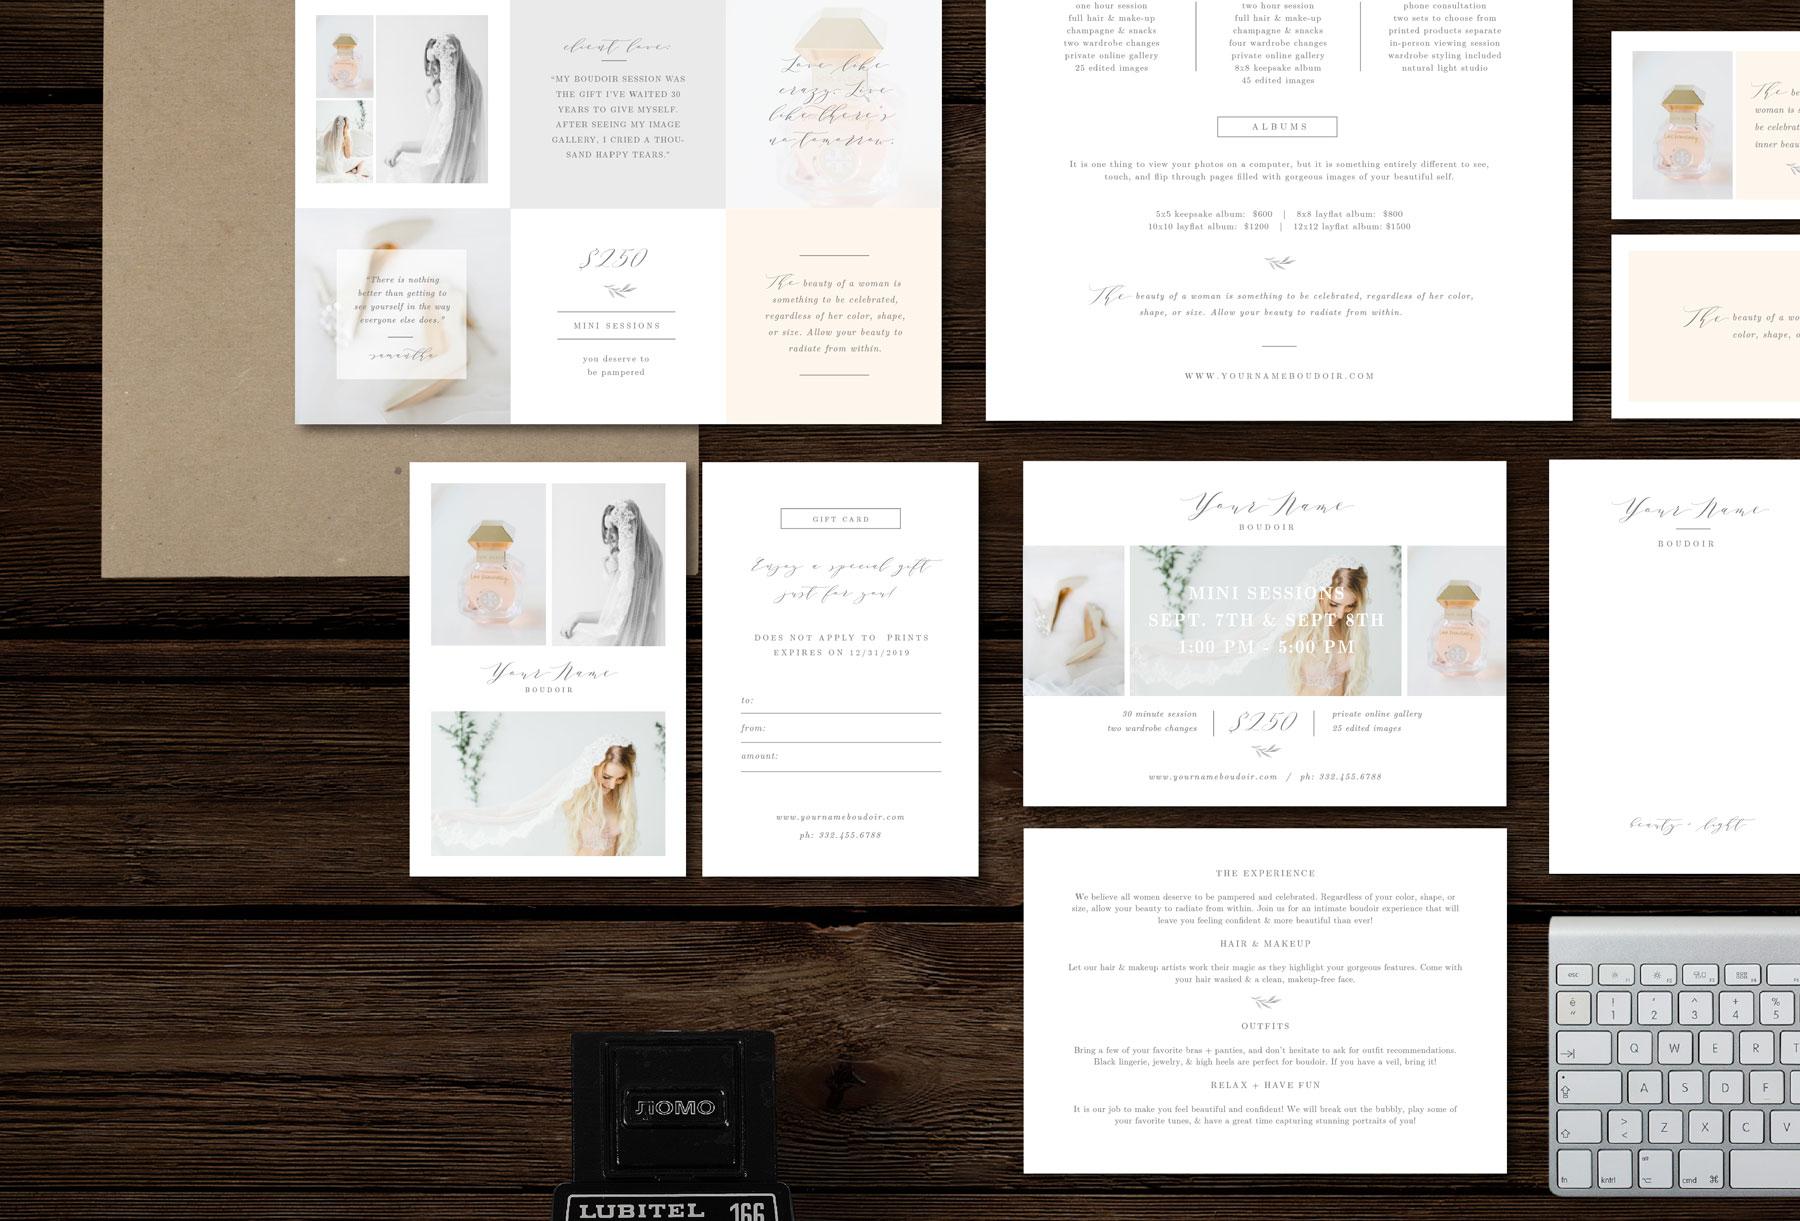 boudoir-photography-marketing-templates